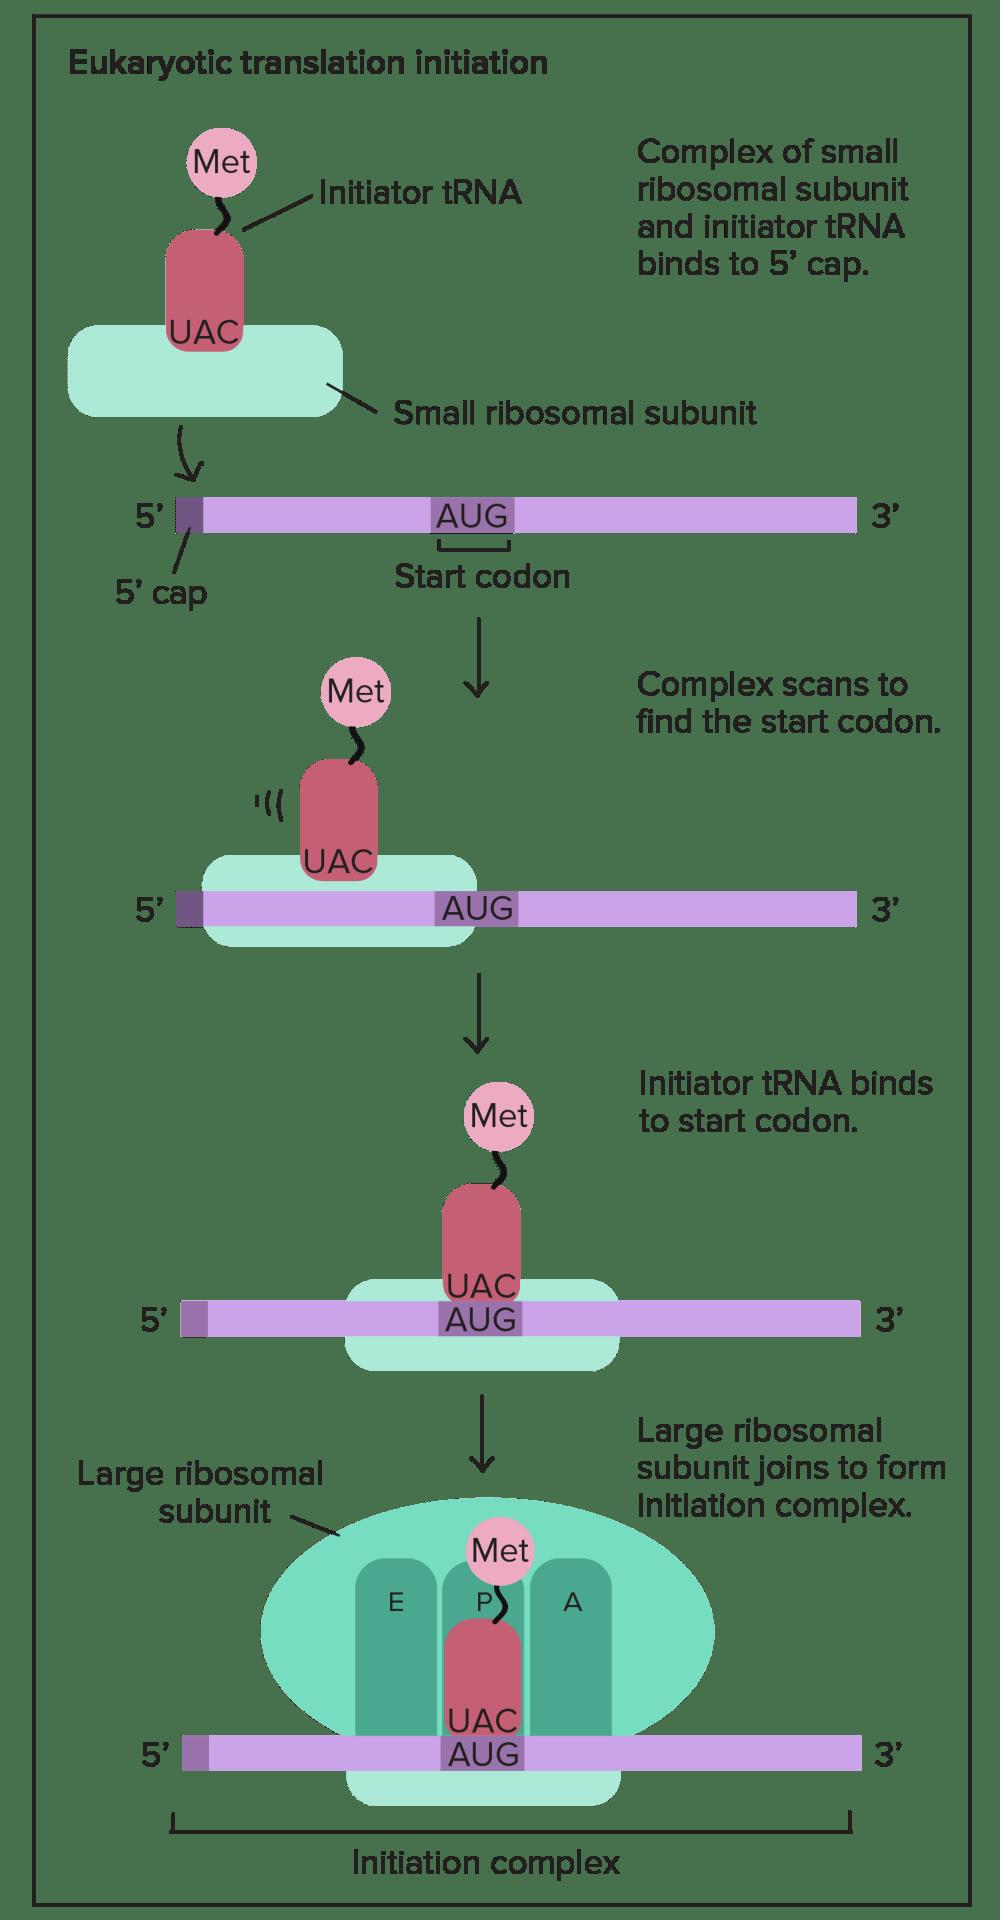 medium resolution of translation mrna to protein video khan academy simple transcription translation dna translation diagram ribosome